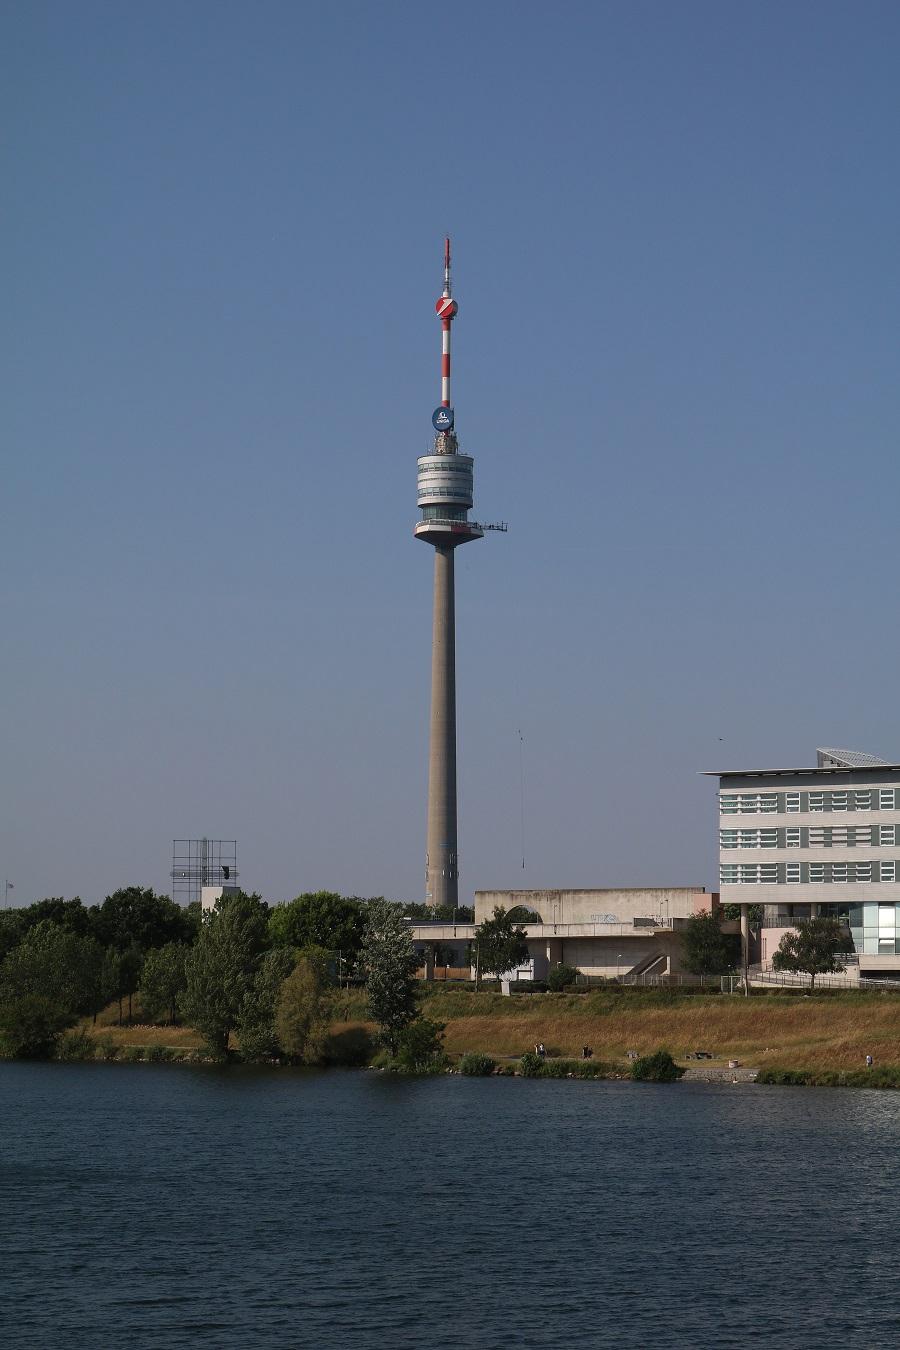 Radiosender Wien Donauturm